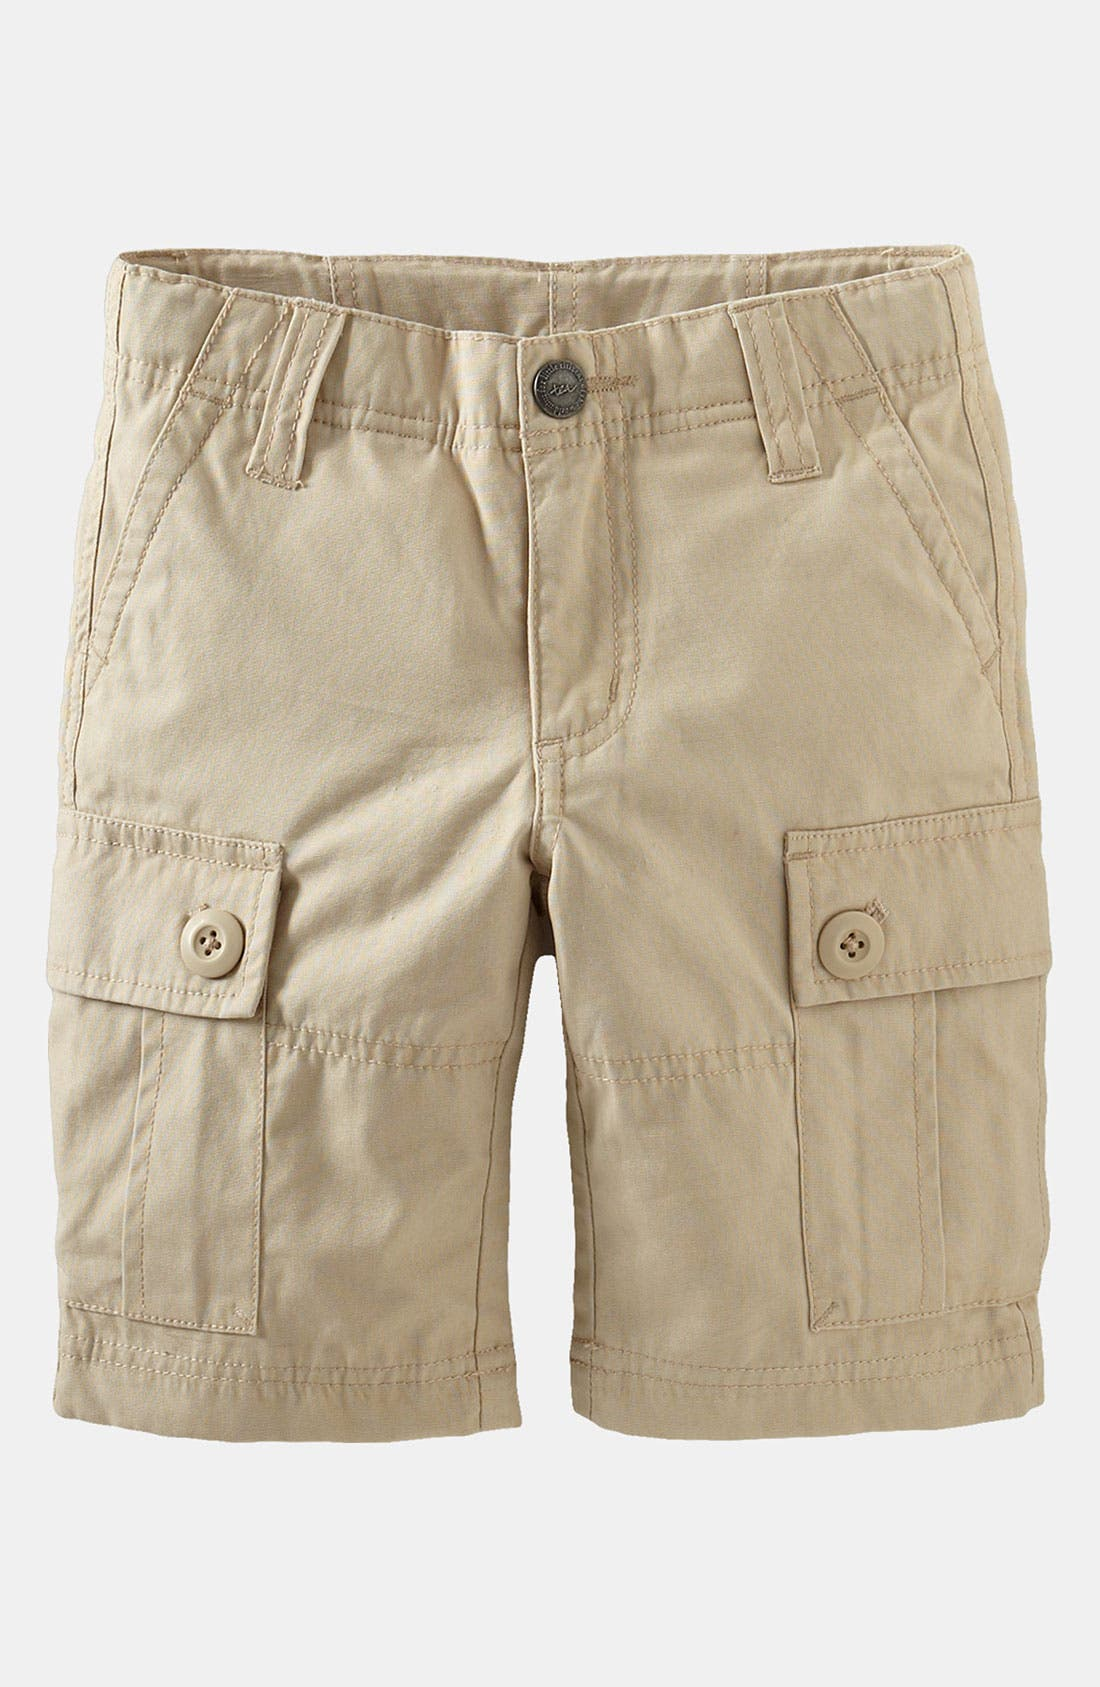 Alternate Image 1 Selected - Tea Collection 'Safari' Cargo Shorts (Toddler)